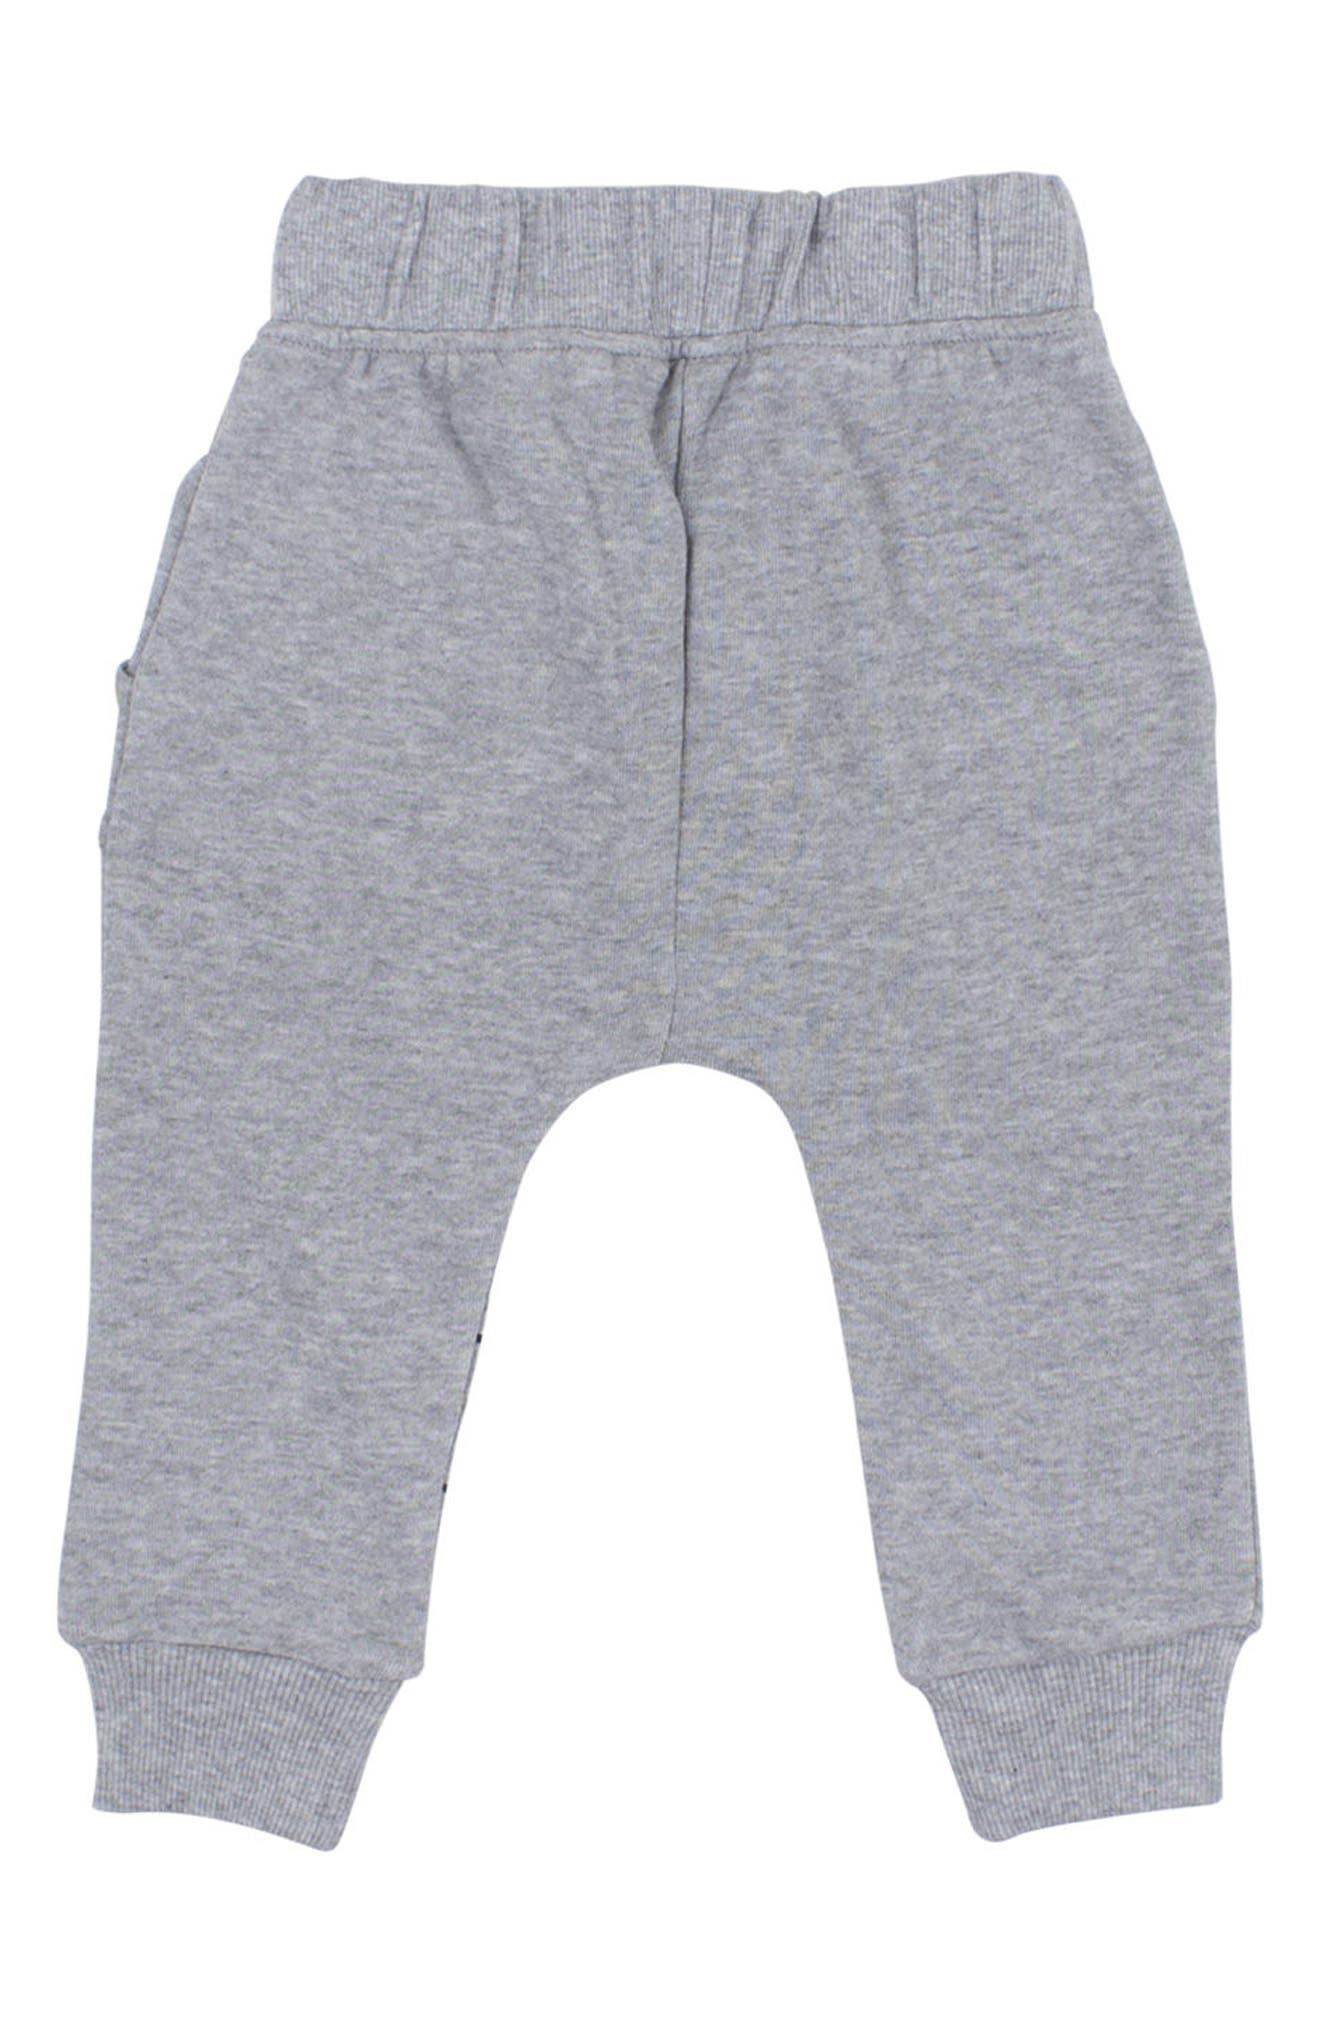 Alternate Image 3  - Tiny Tribe Rockstar T-Shirt & Jogger Pants Set (Baby)